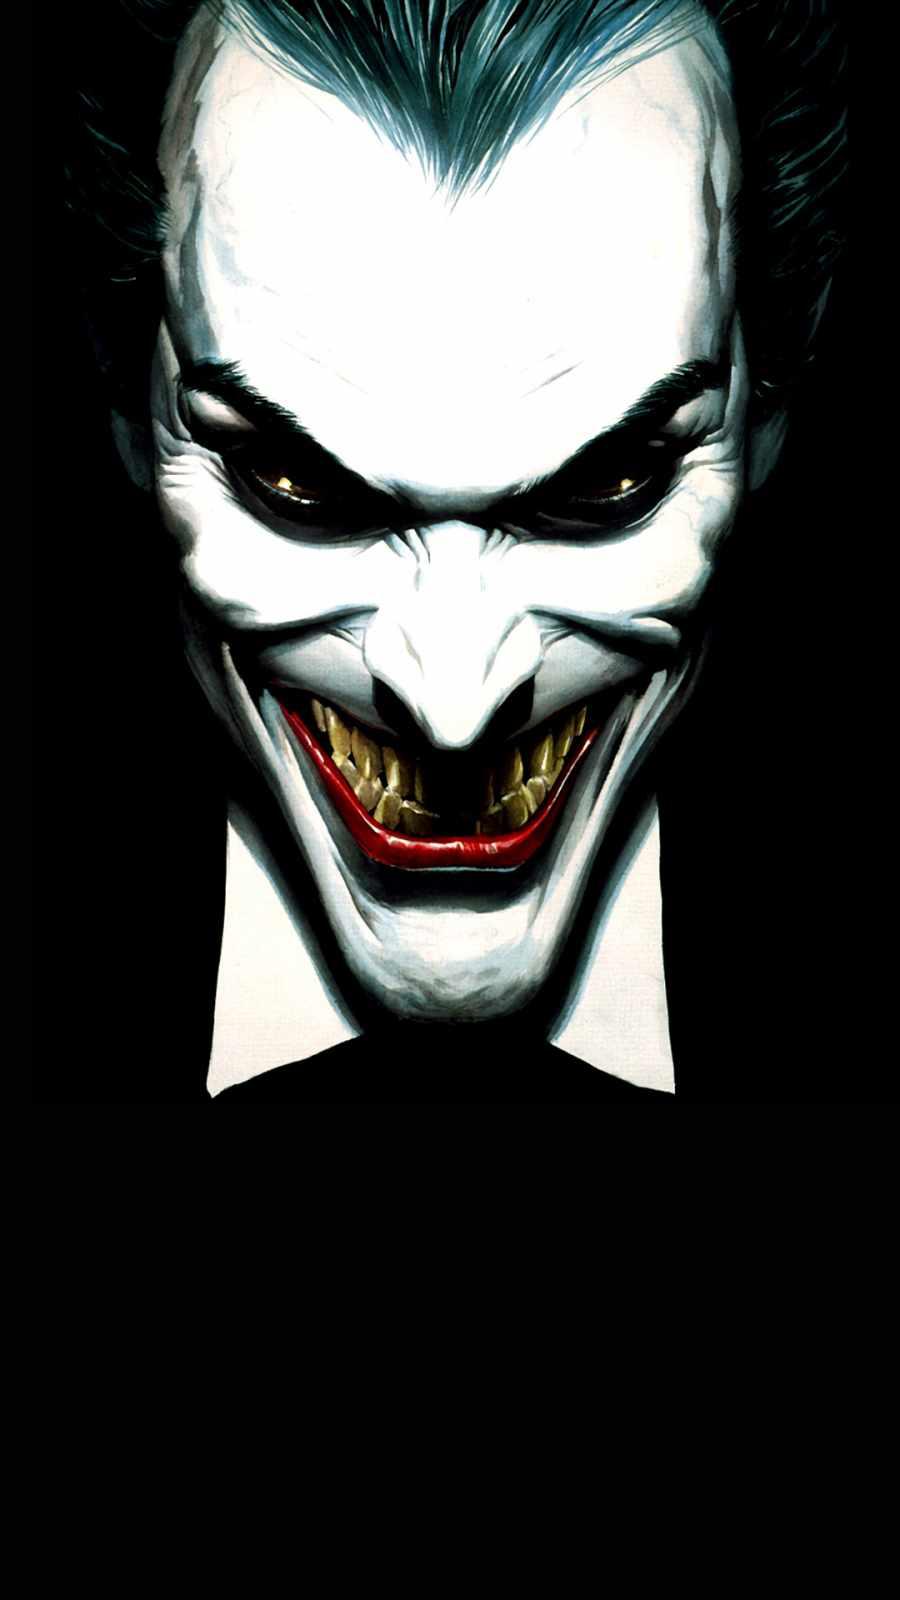 Joker Smile iPhone Wallpaper